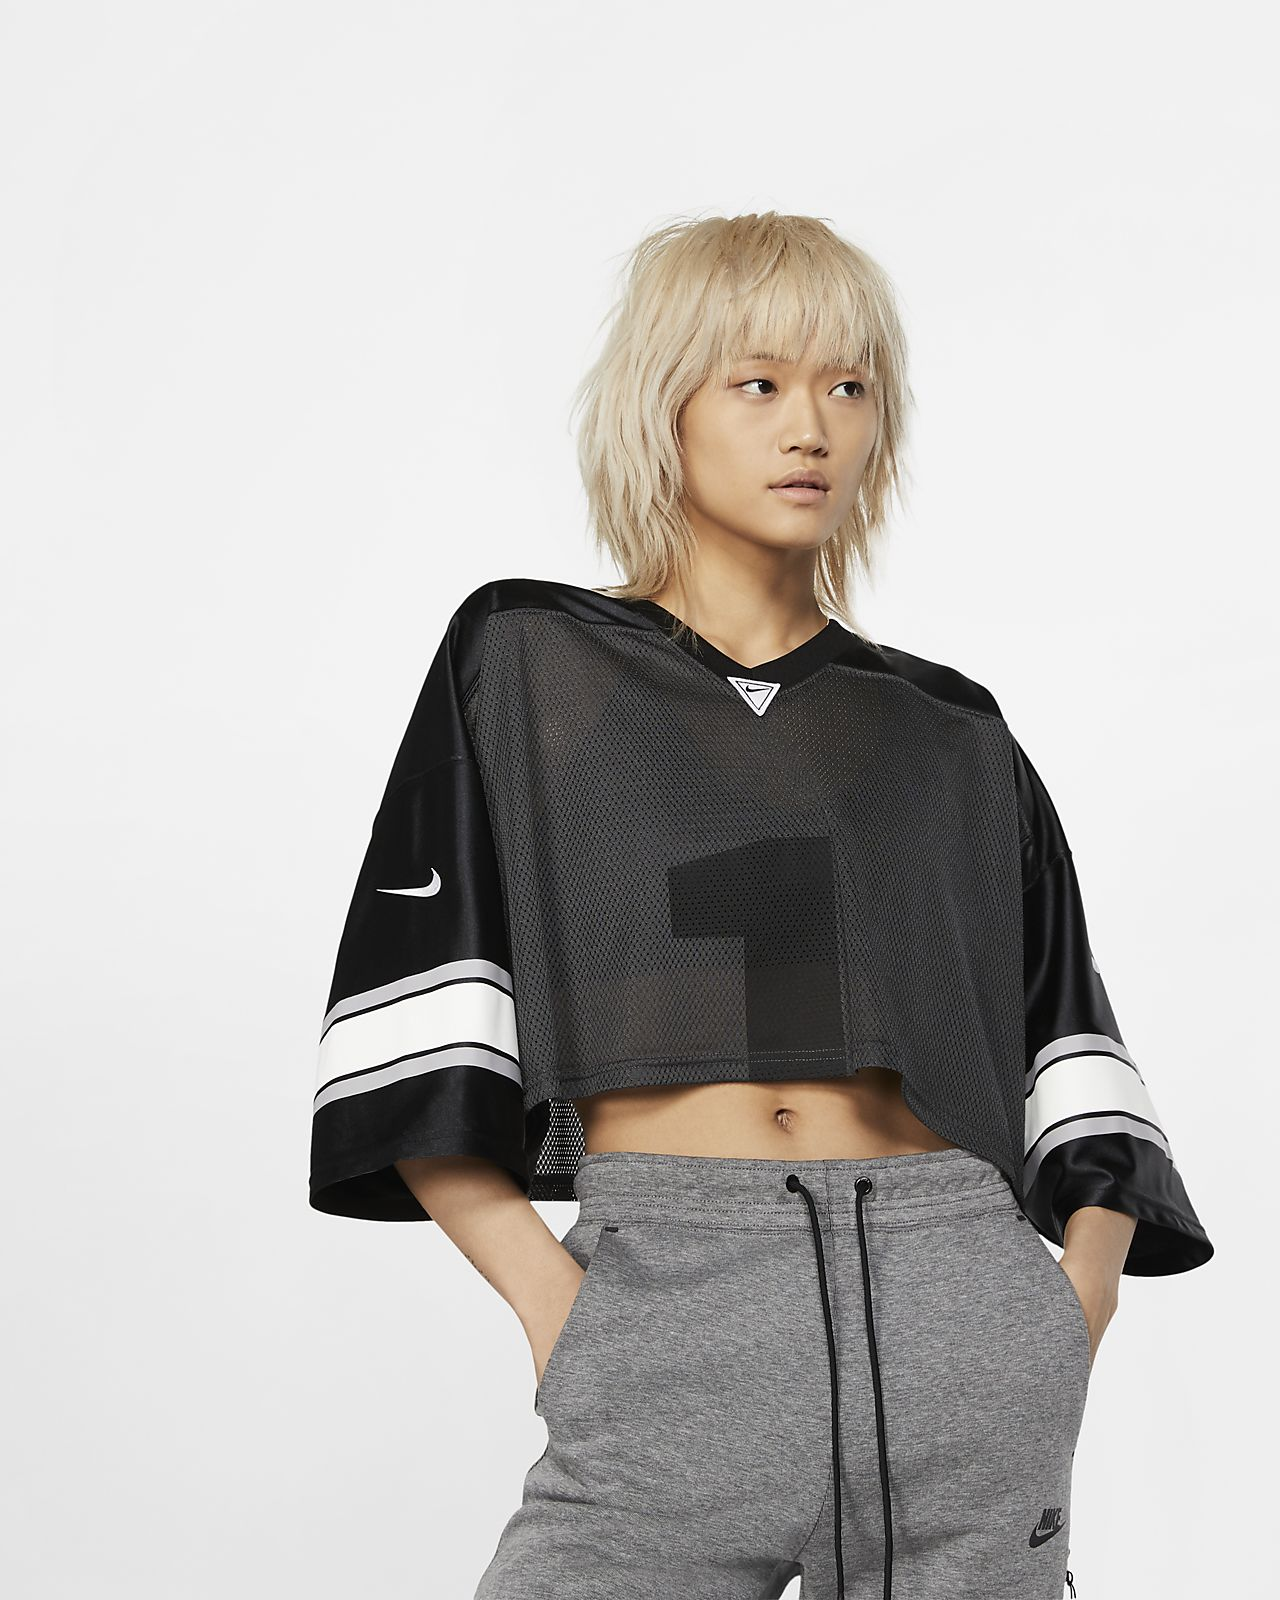 Camisola de futebol NikeLab Collection para mulher